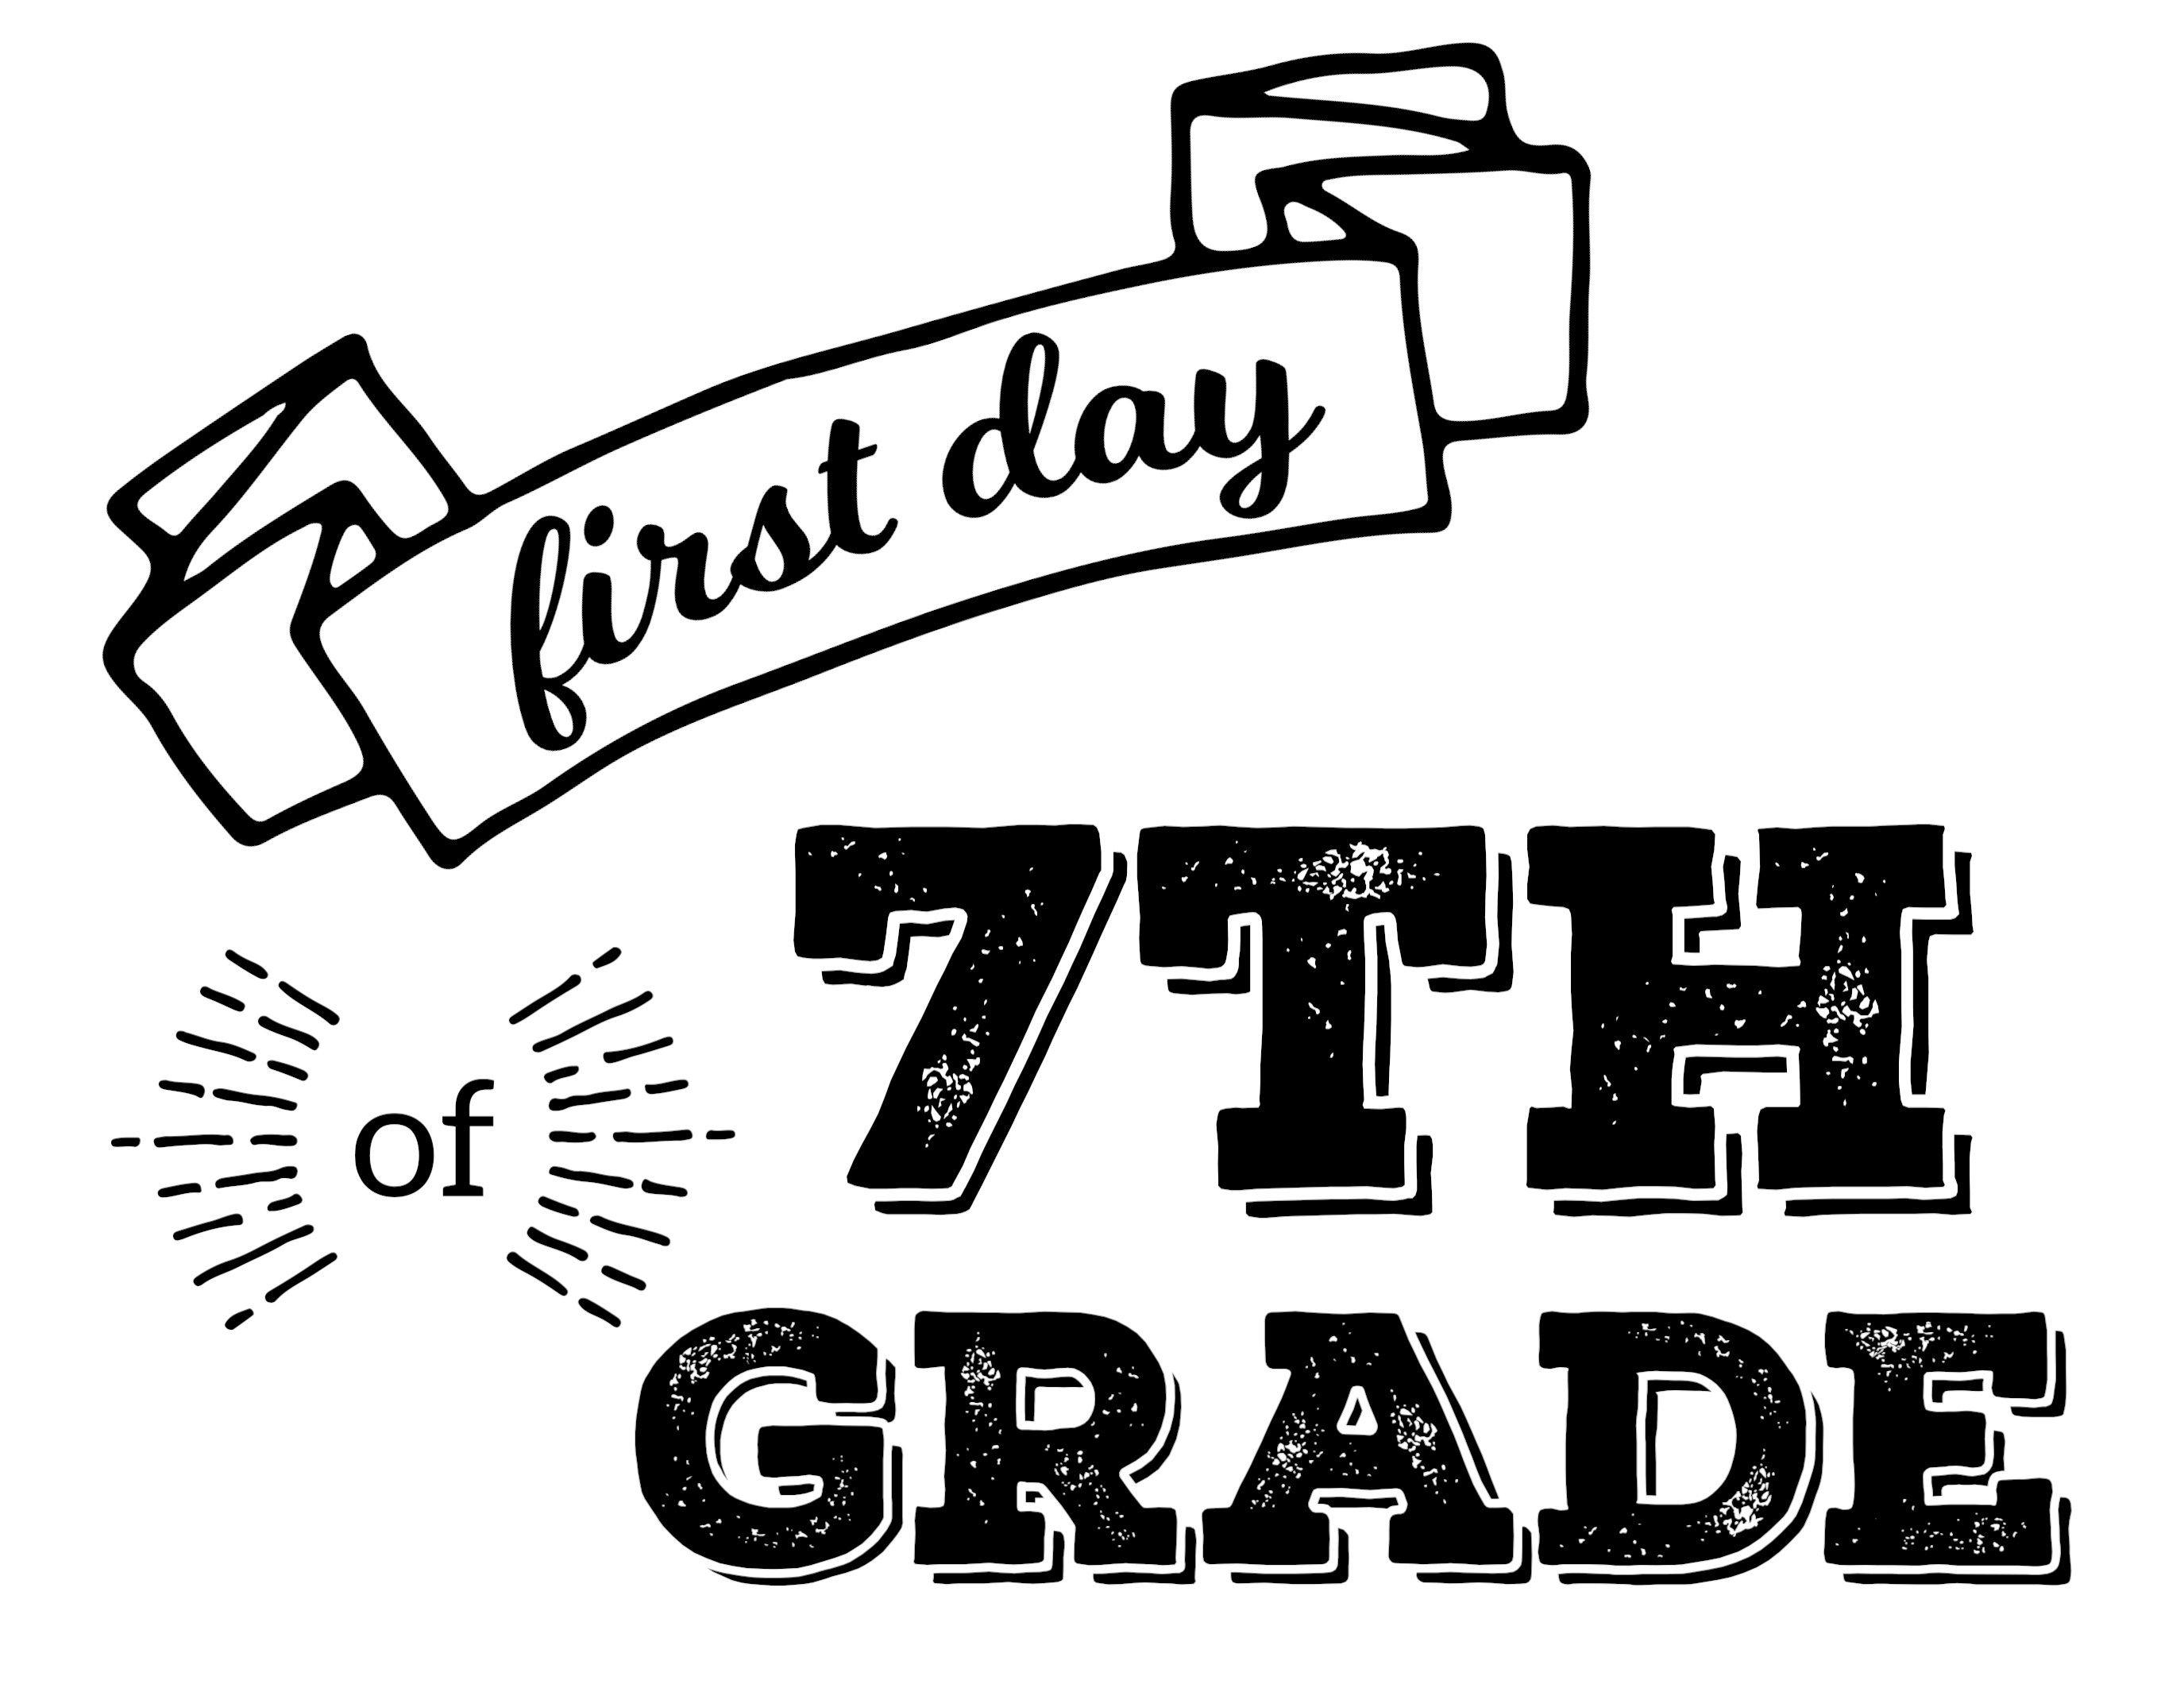 Pinchristie Arsenault Mozelak On Kid Stuff | Pinterest | School - First Day Of Fourth Grade Free Printable